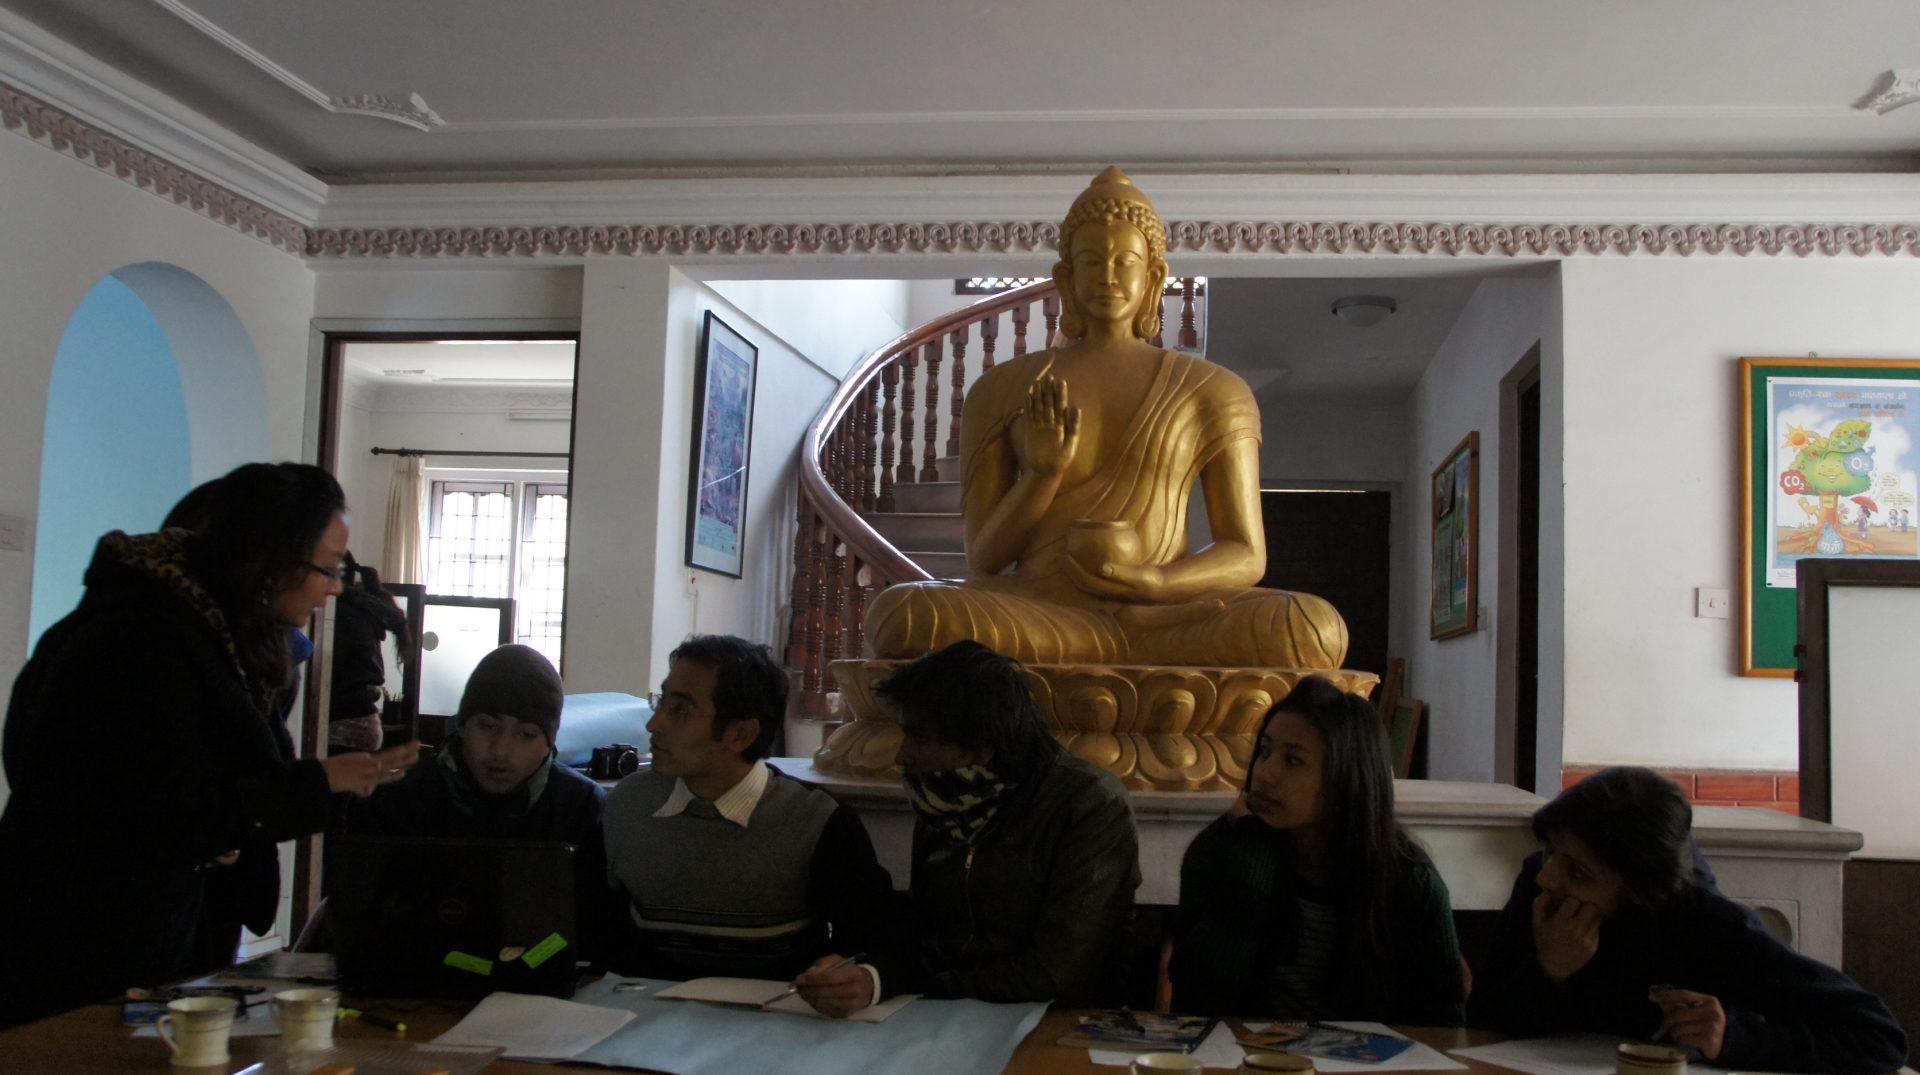 Sous le regard de Bouddha WCN Kathmandou Népal